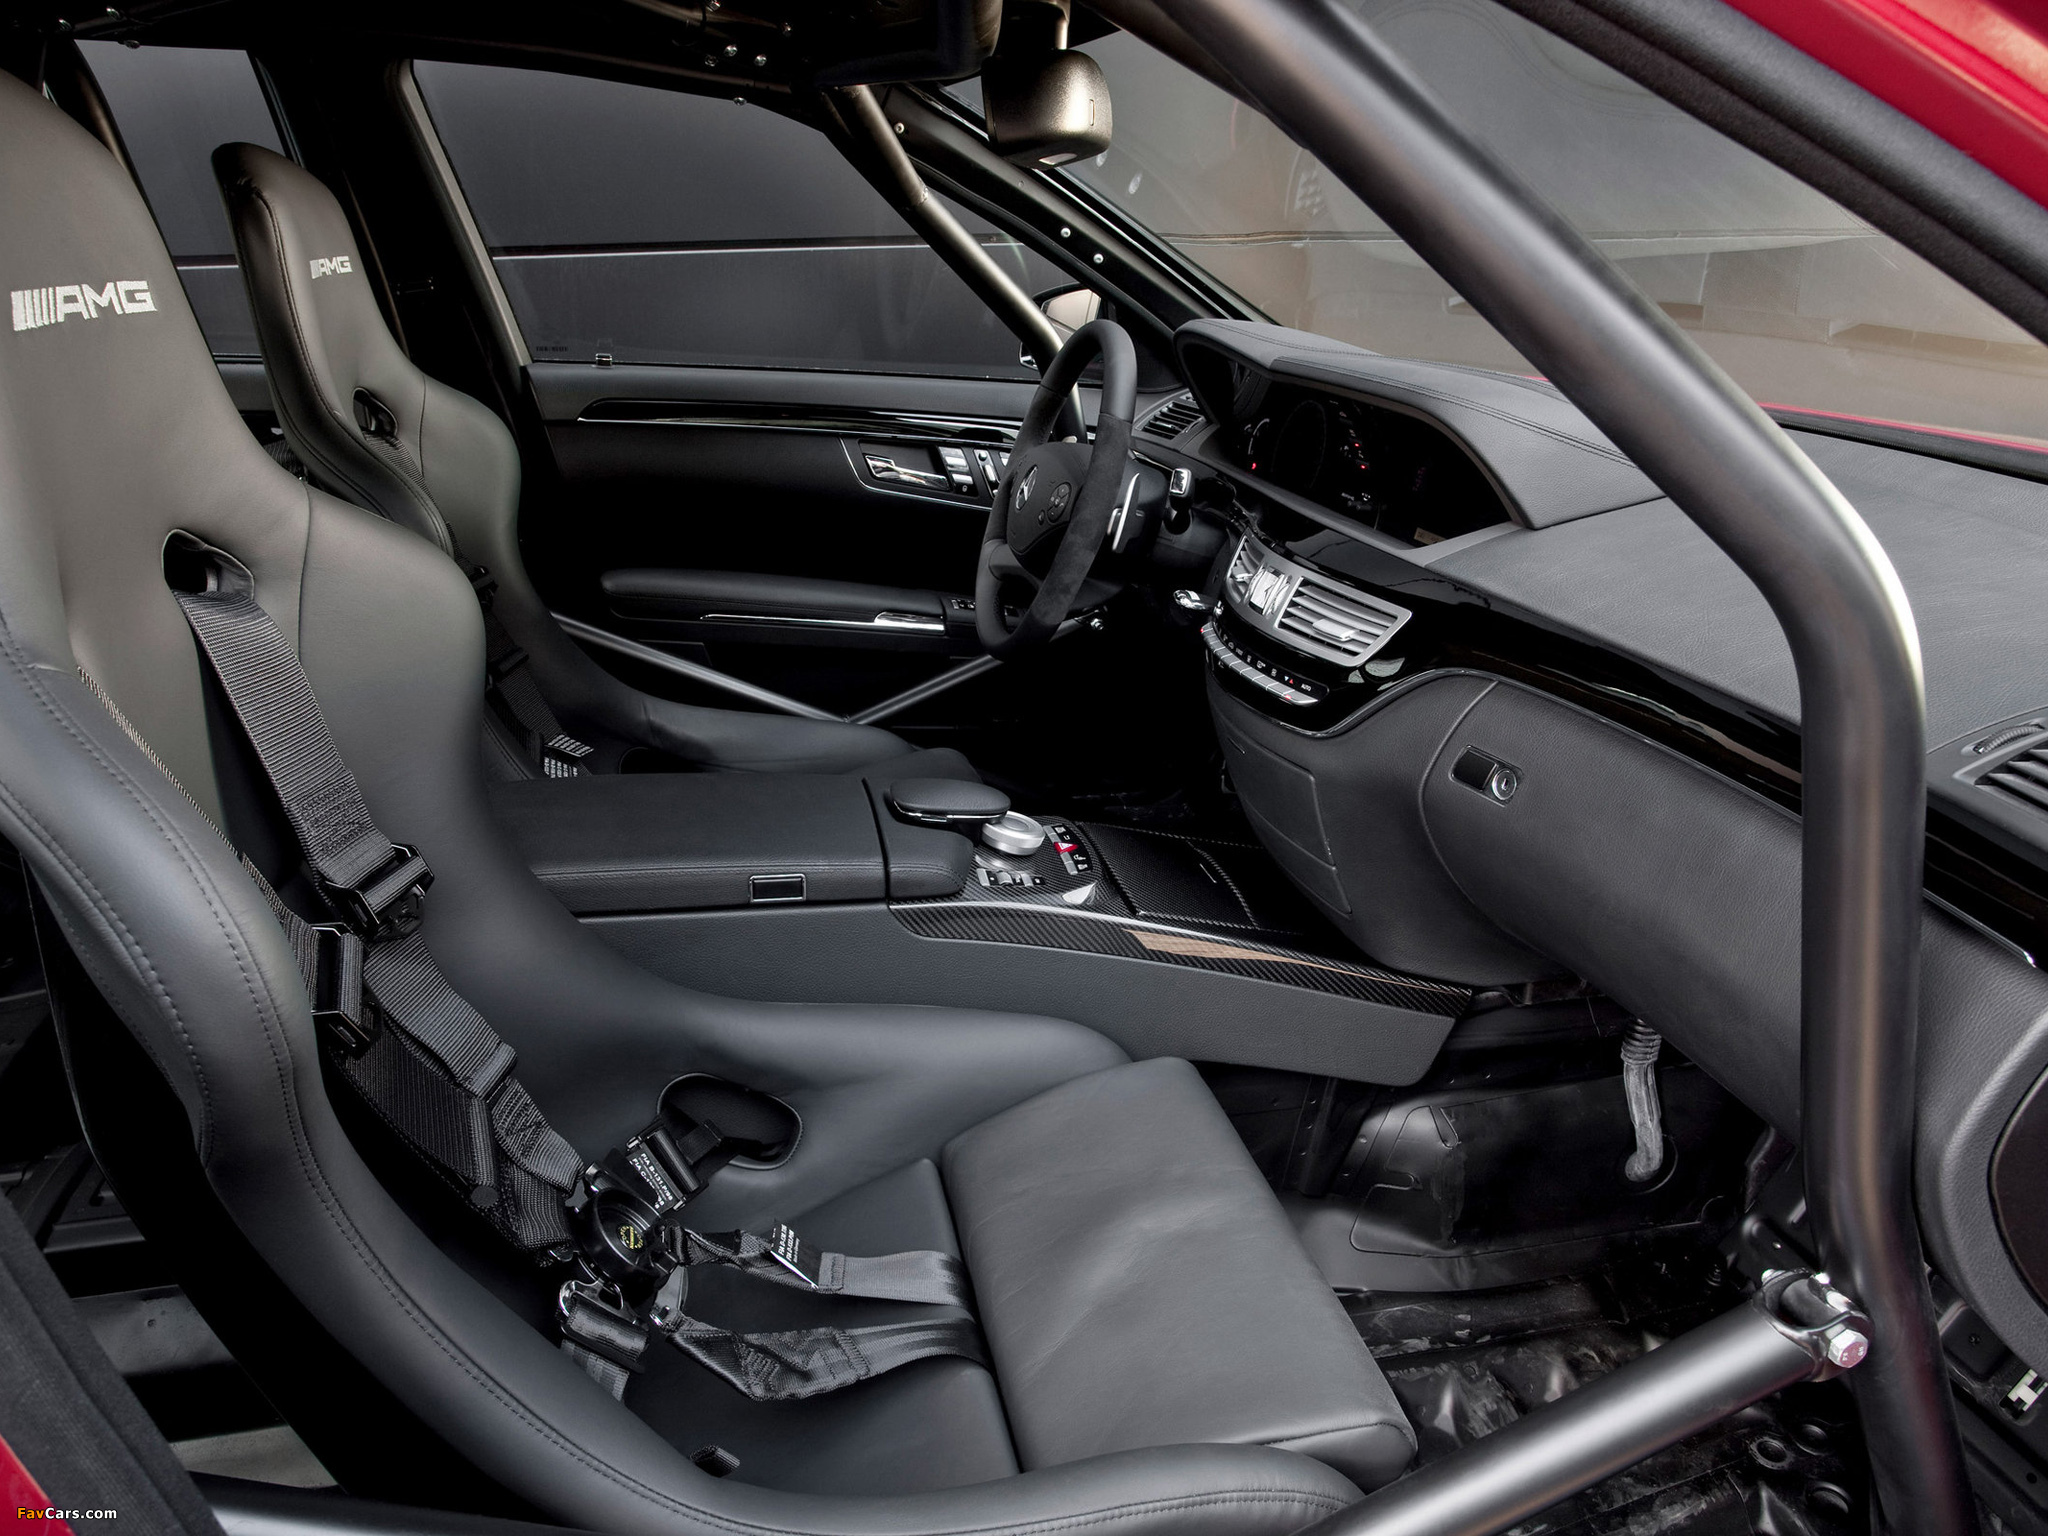 Mercedes-Benz S 63 AMG Show Car (W221) 2010 photos (2048 x 1536)